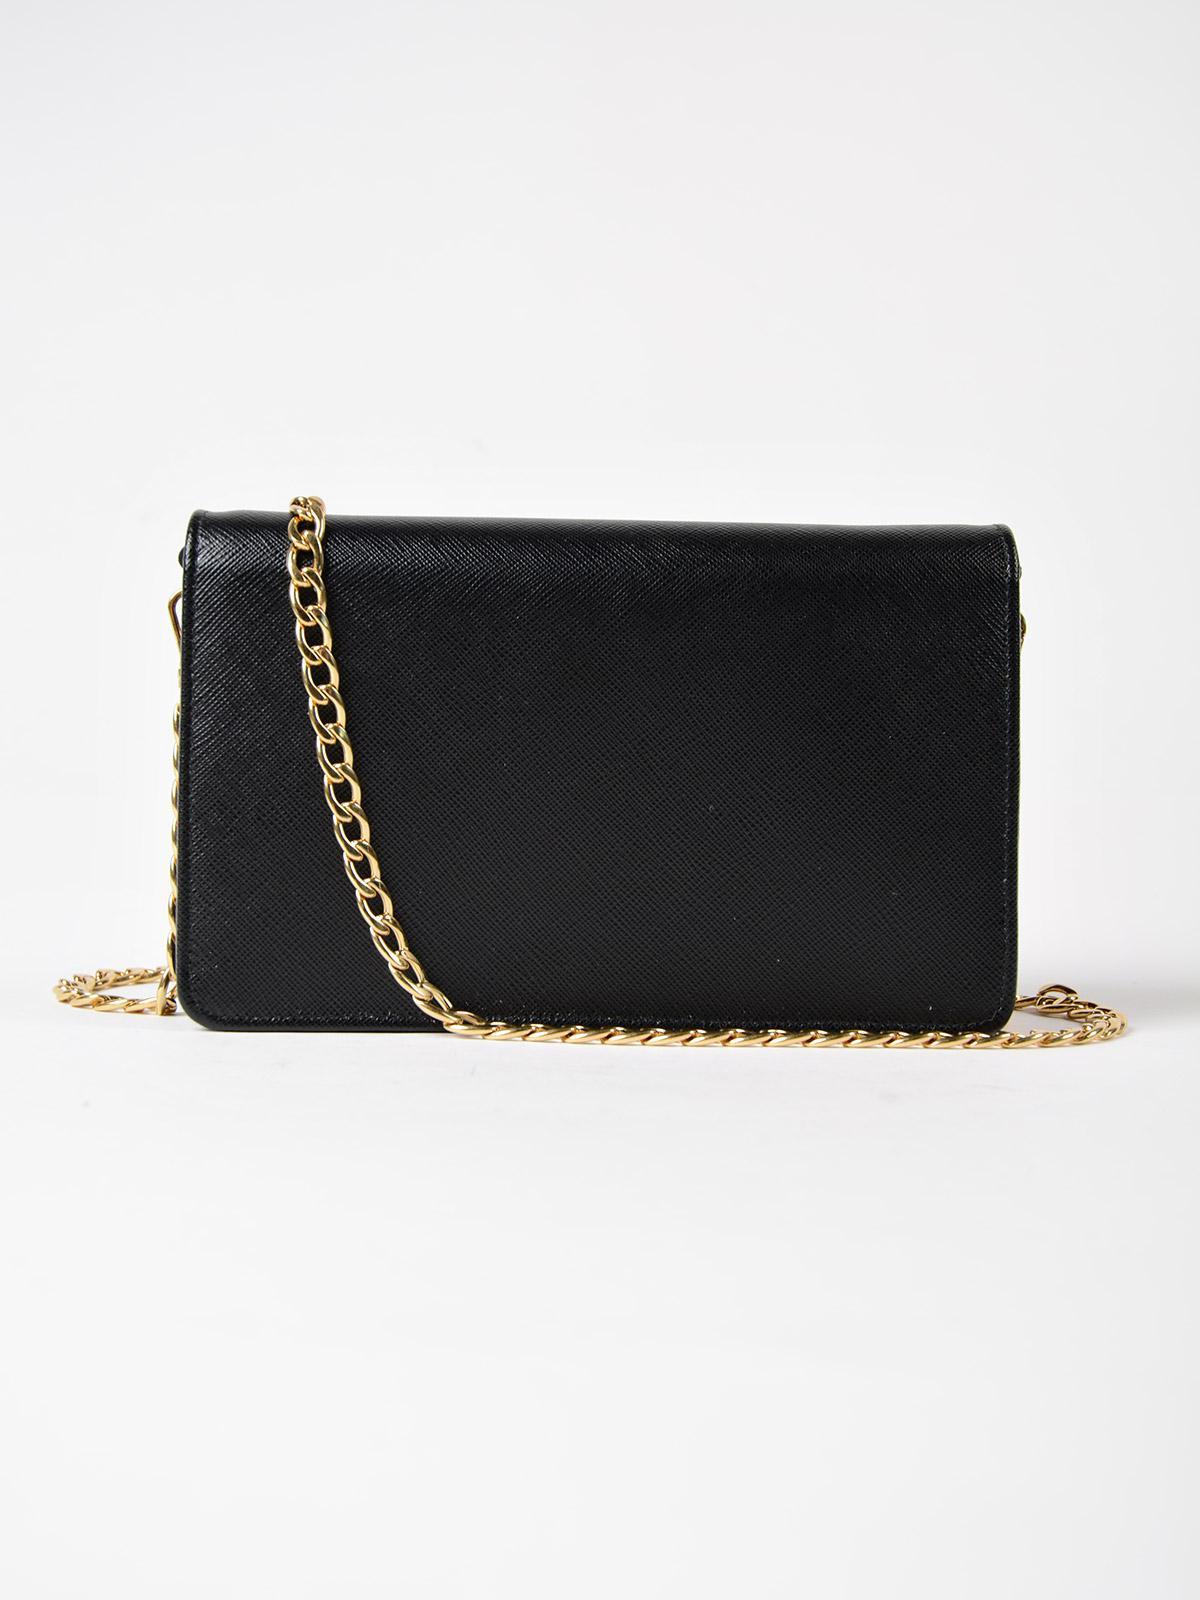 Lyst - Prada Saffiano Lux Wallet Bag in Black b6d338851ca05